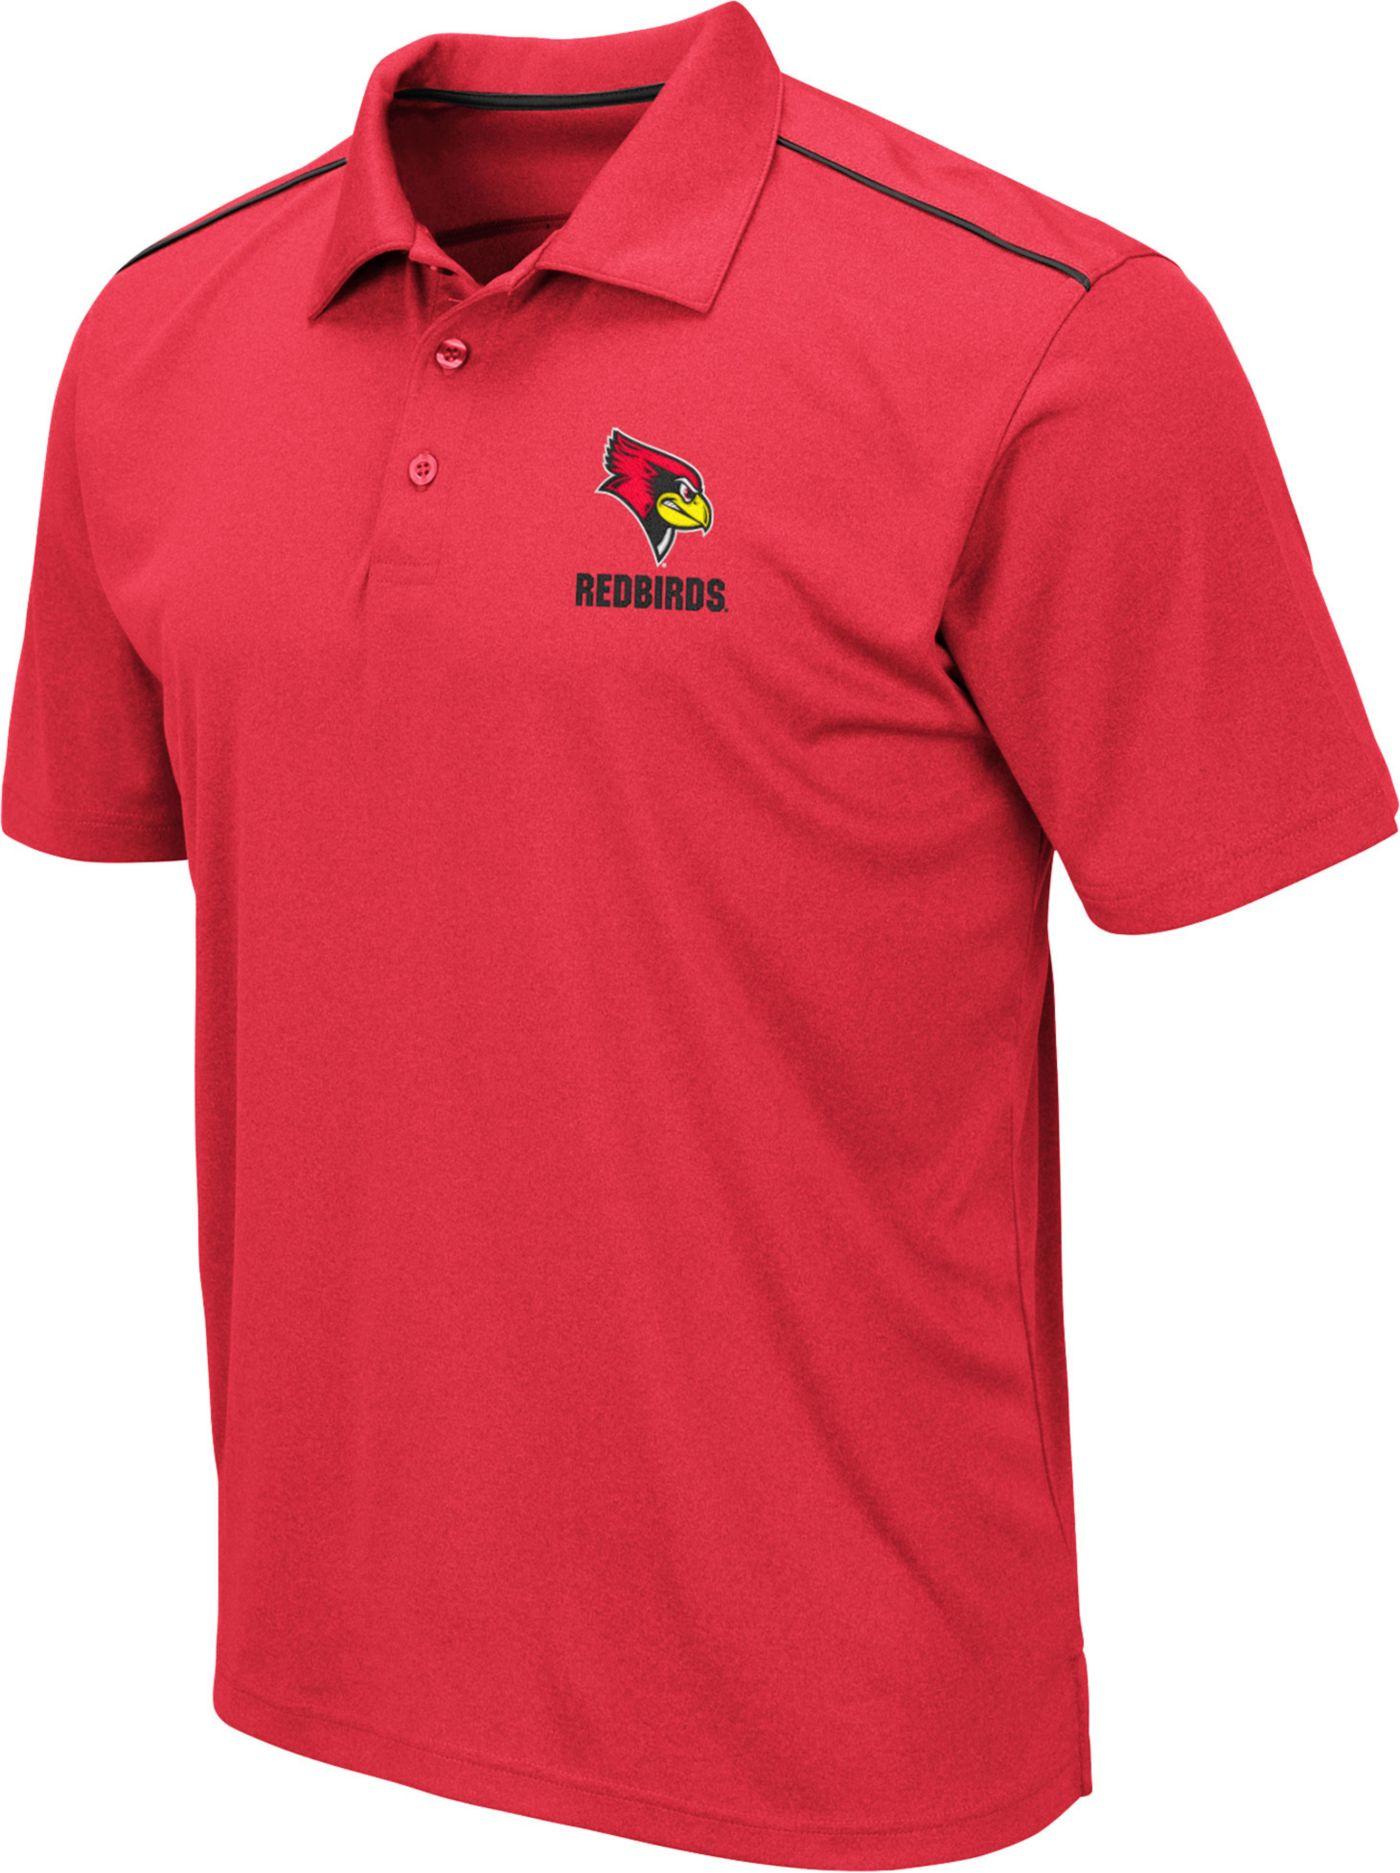 Colosseum Men's Illinois State Redbirds Red Eagle Polo